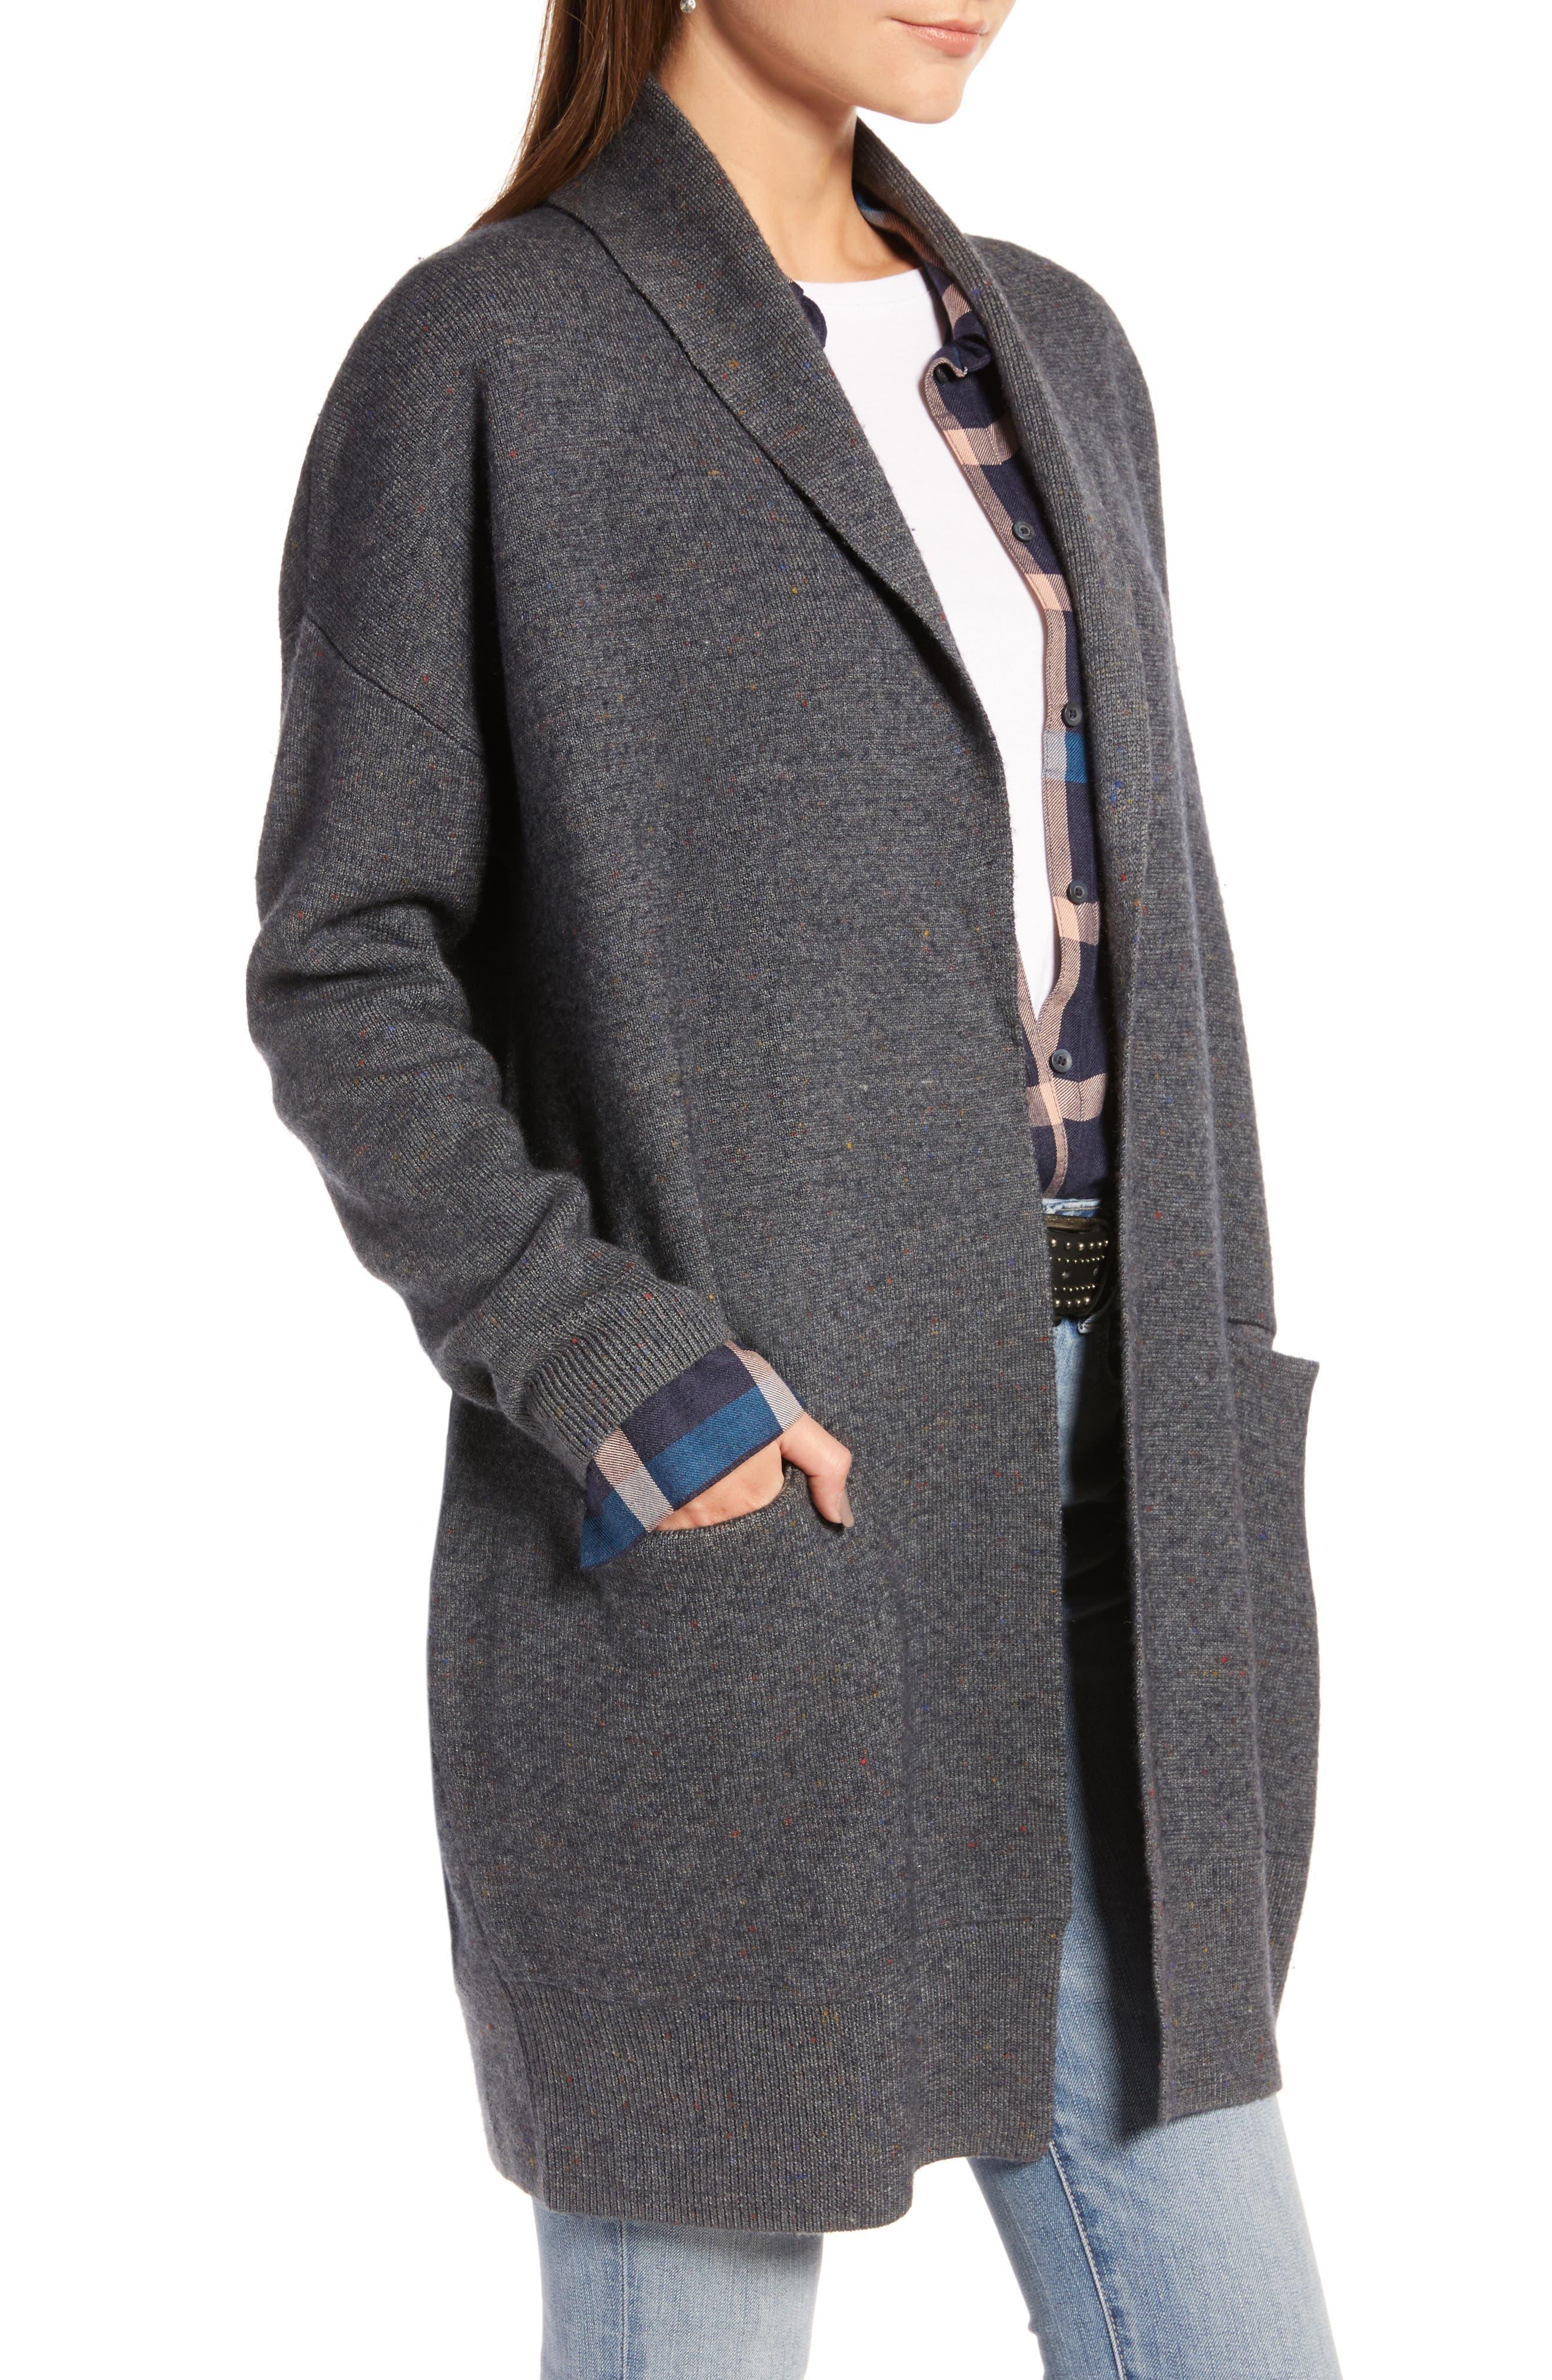 TREASURE & BOND,                             Boiled Wool Blend Long Cardigan,                             Alternate thumbnail 3, color,                             030